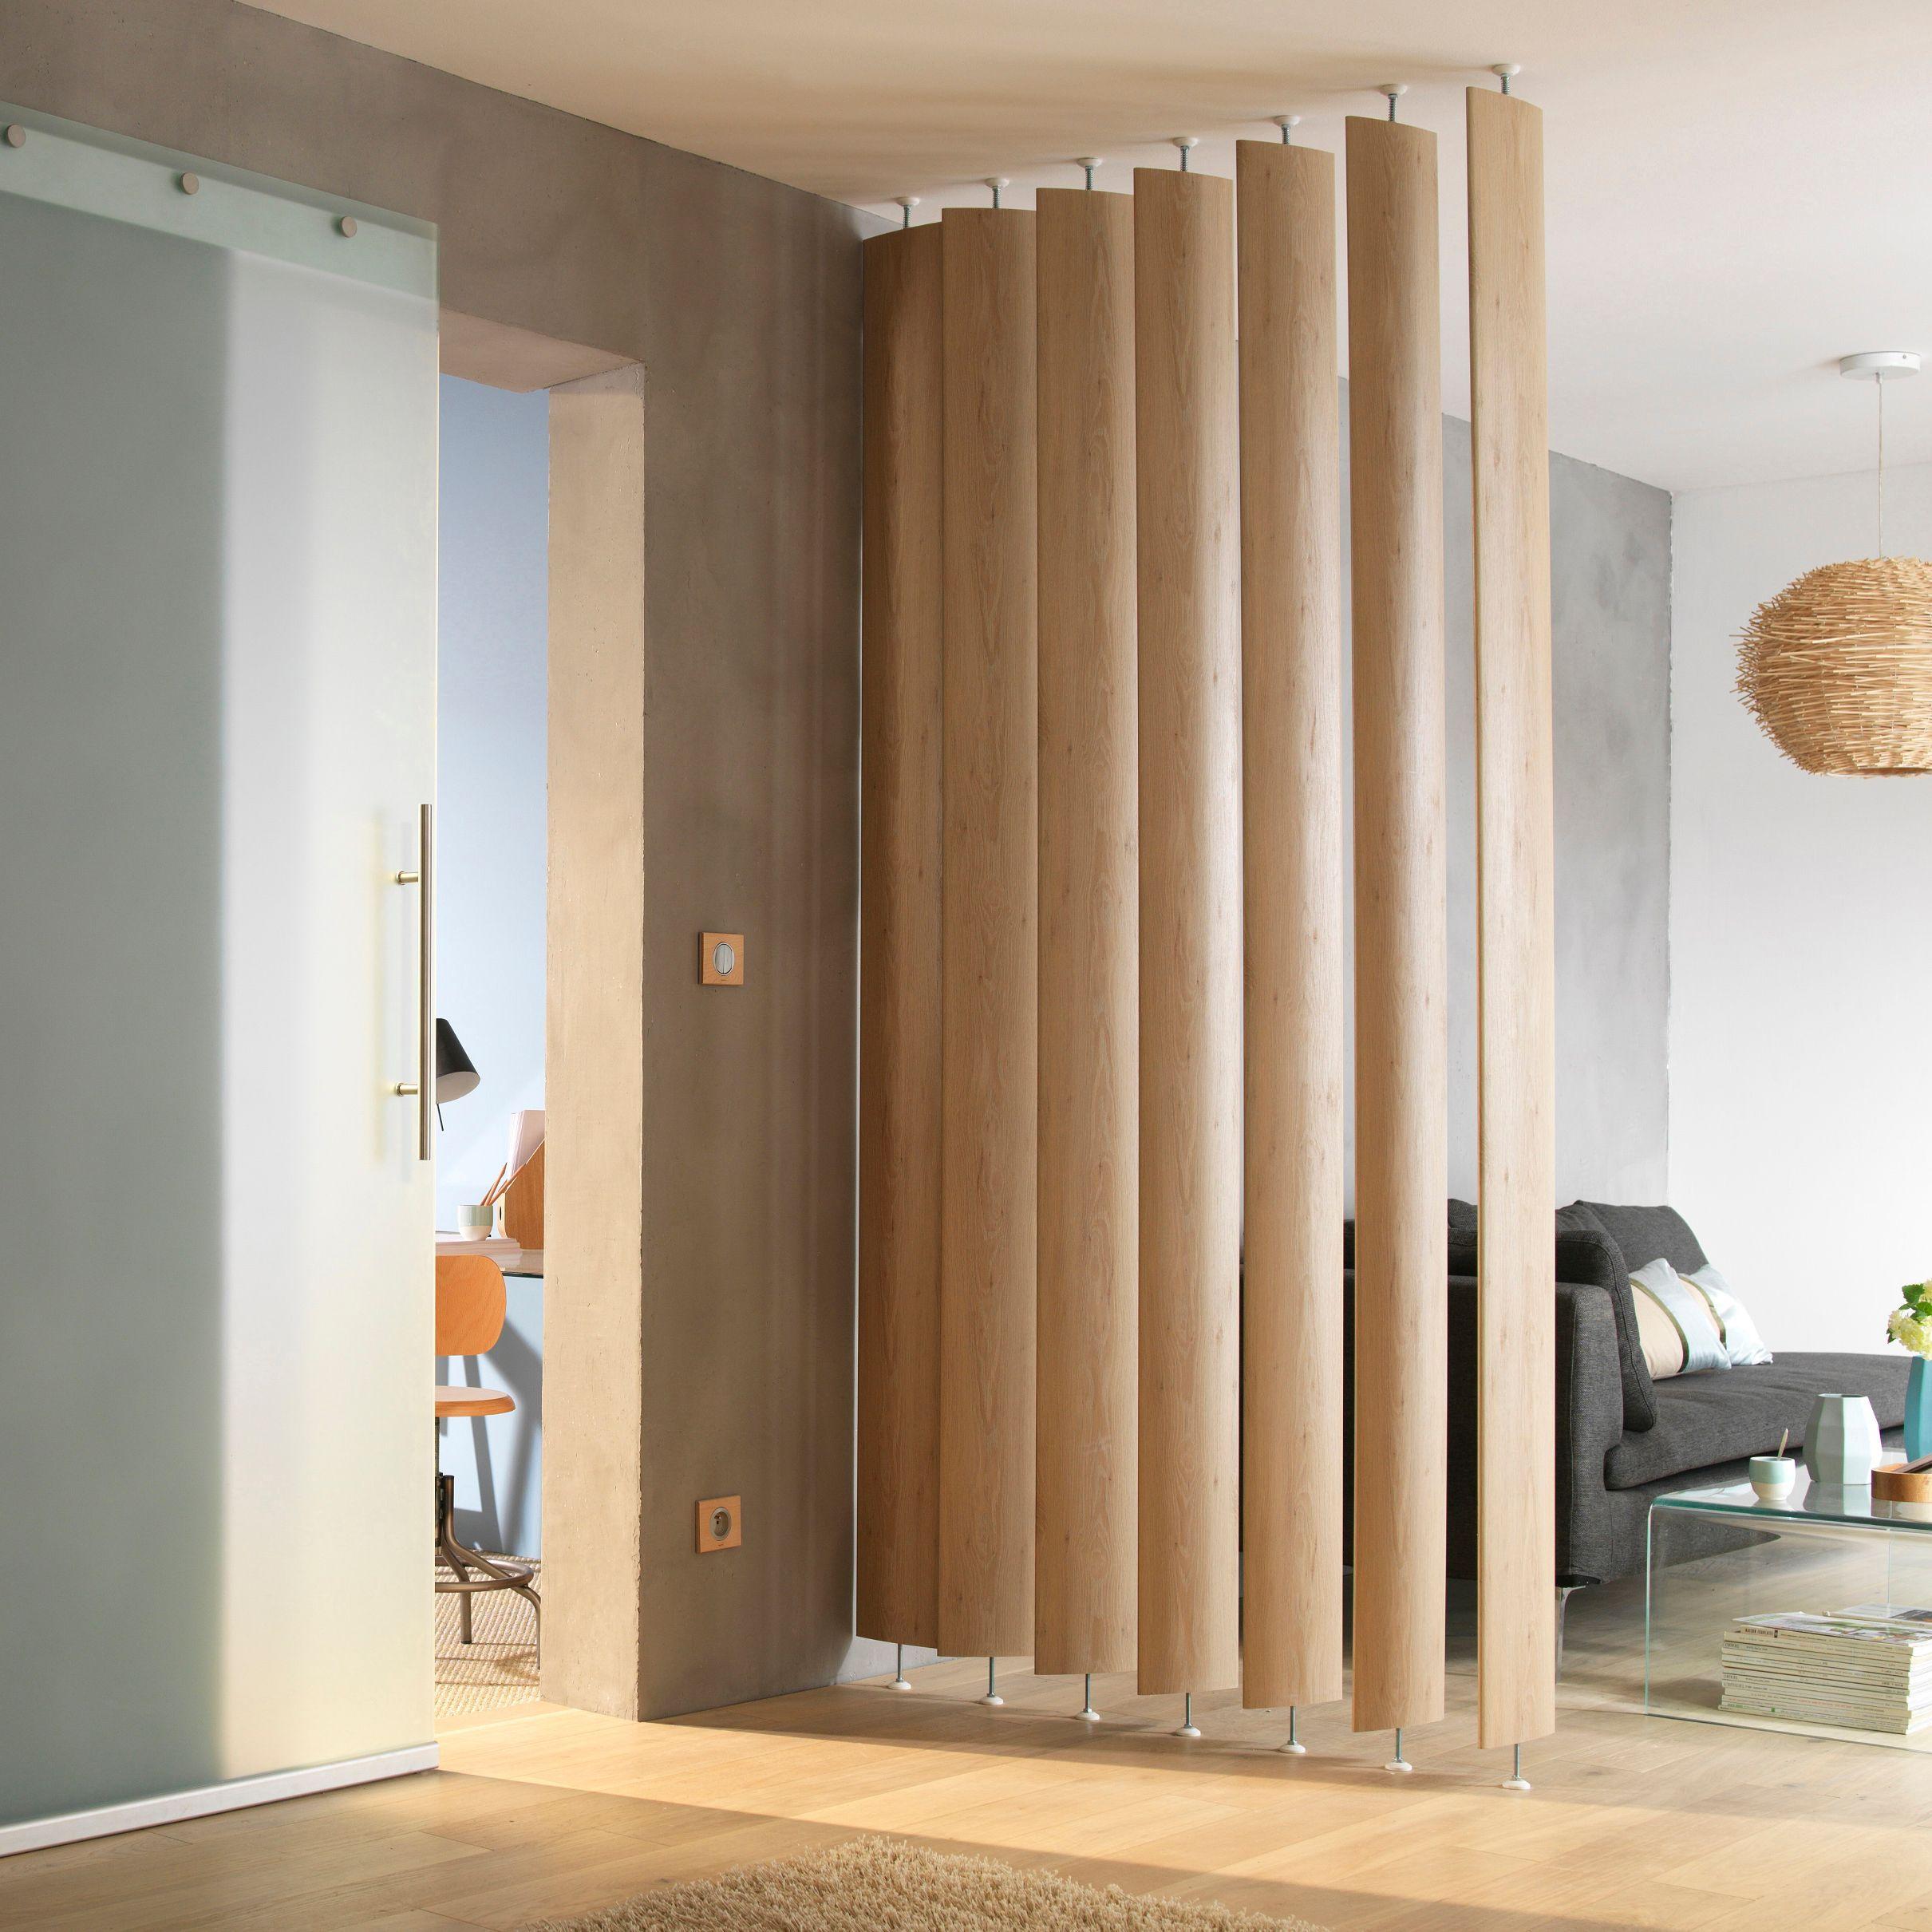 Ella White Oak Room Divider Pack Of 5 Departments DIY